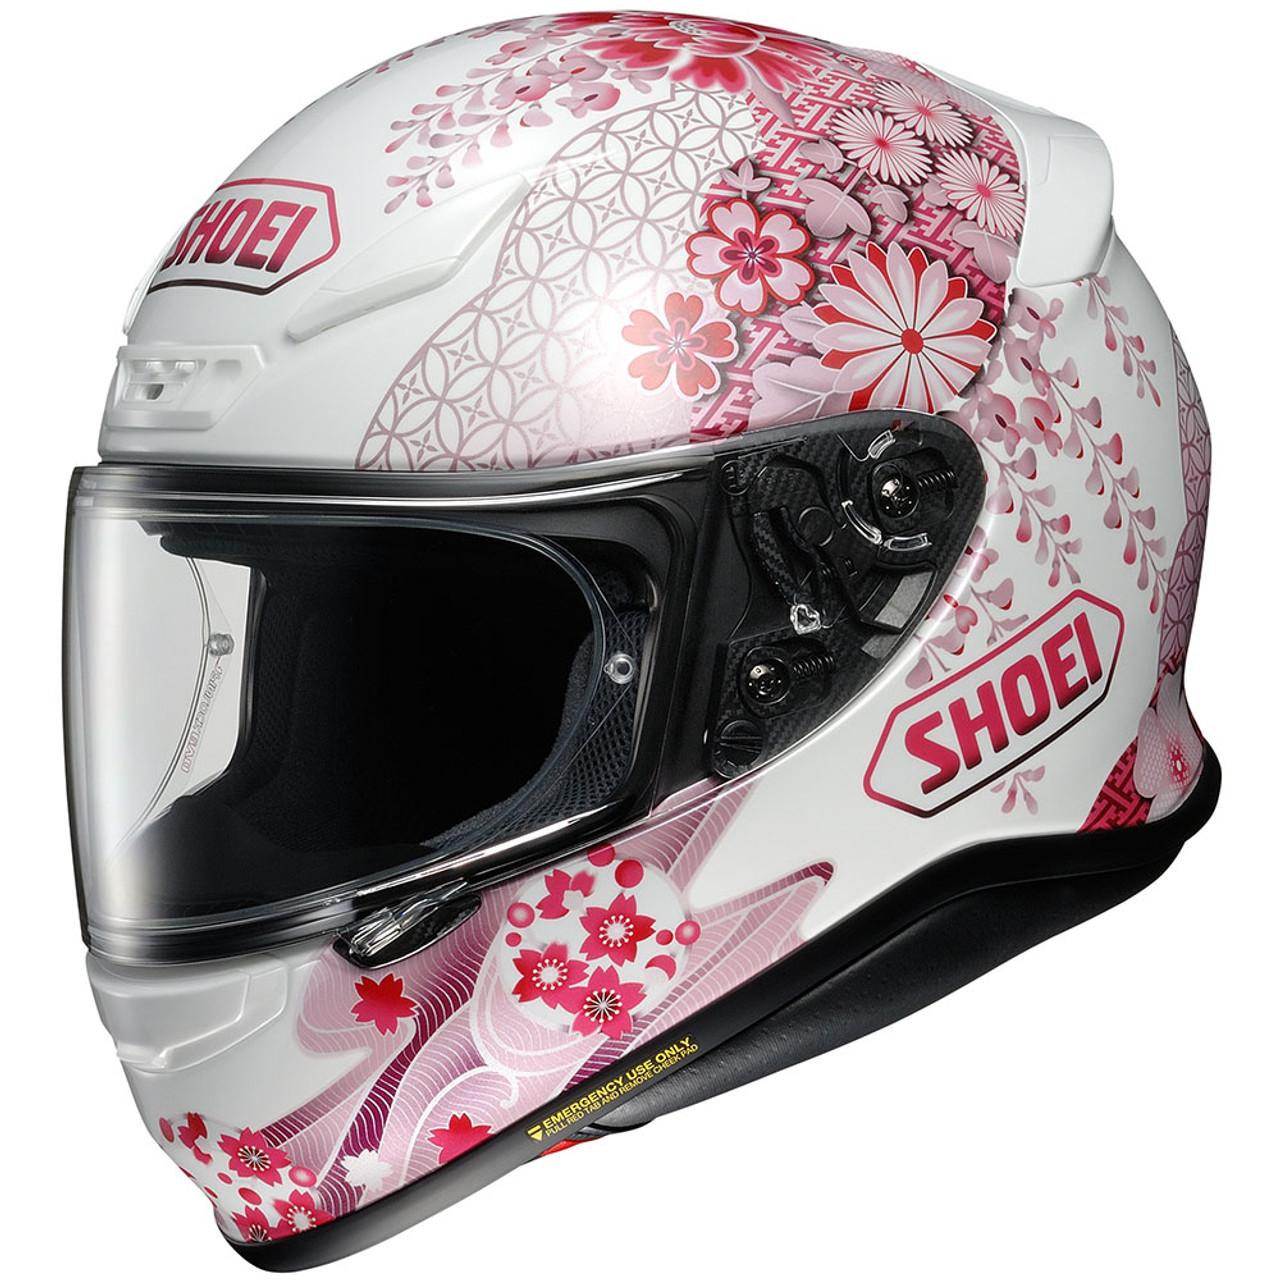 Shoei RF-1200 Harmonic Helmet - Pink